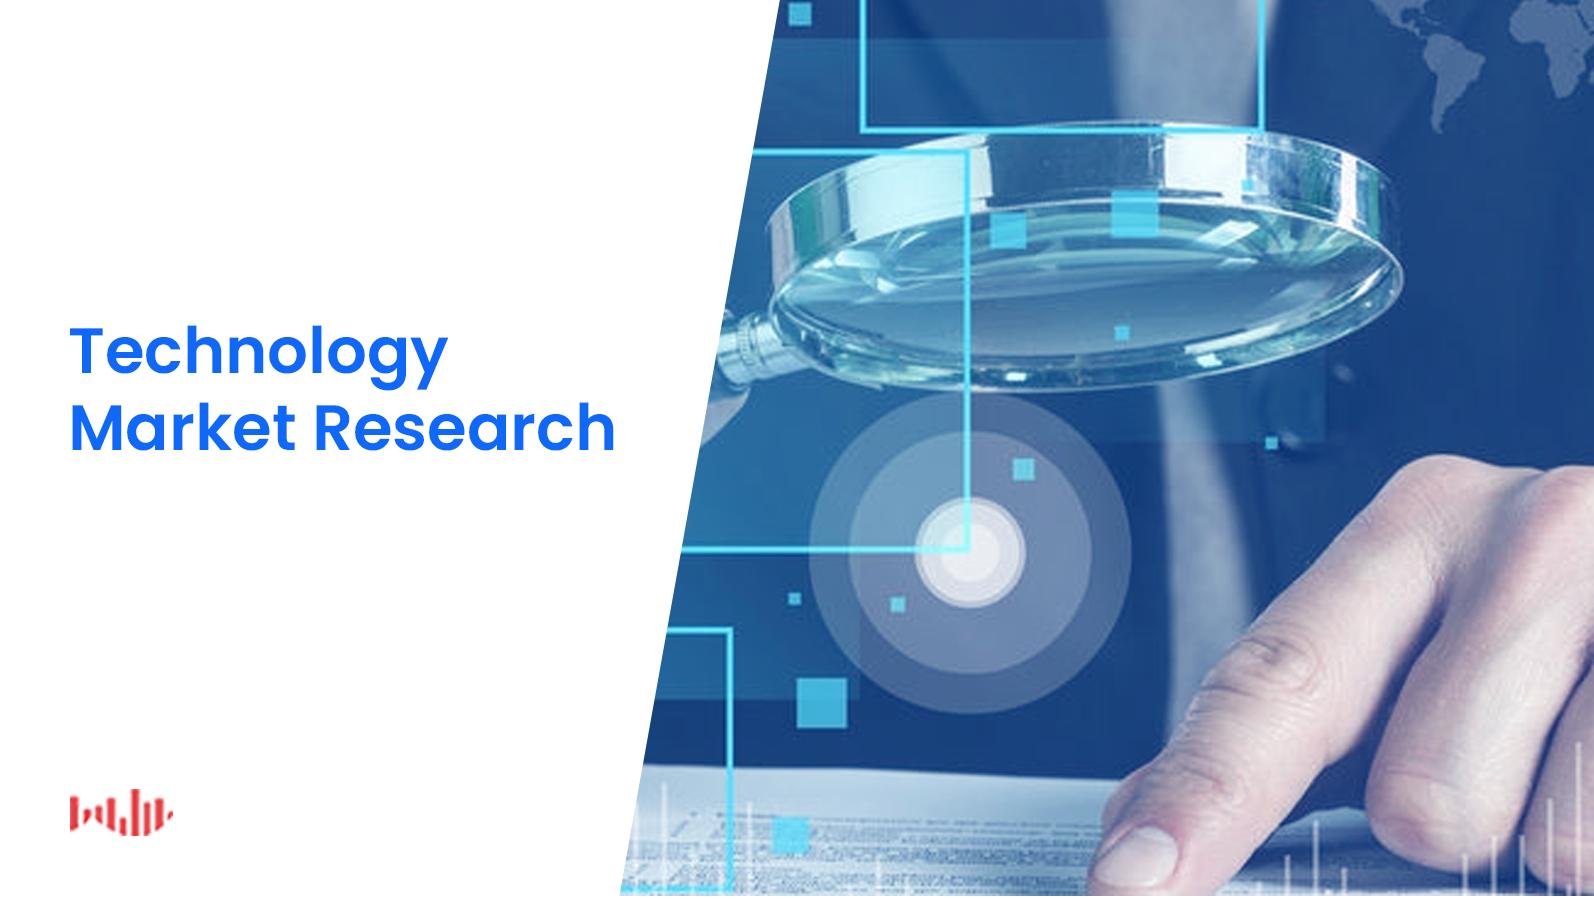 technology market research